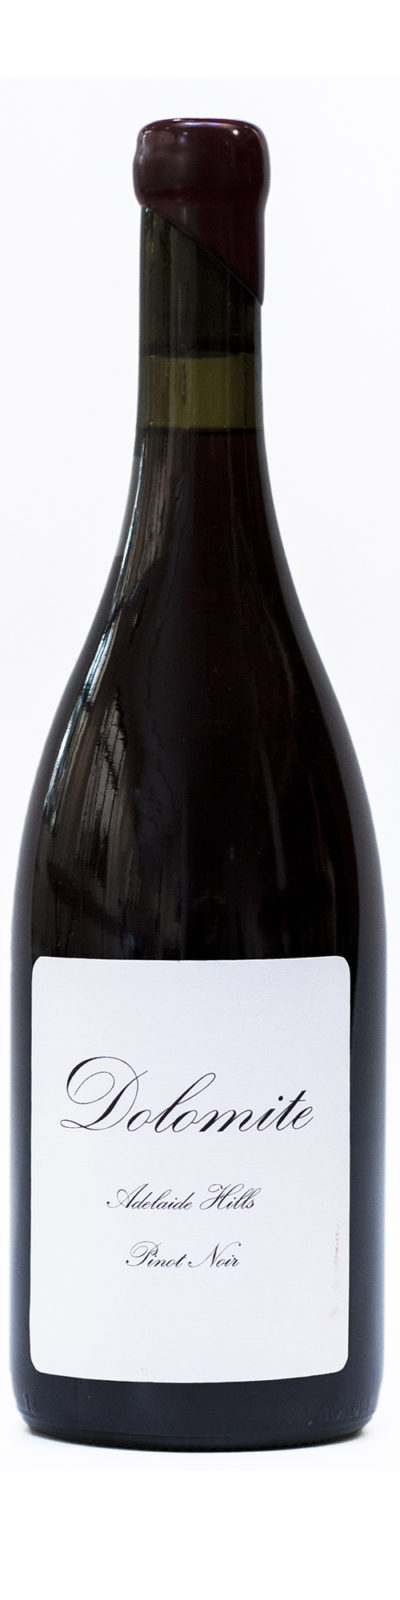 Dolomite Pinot Noir